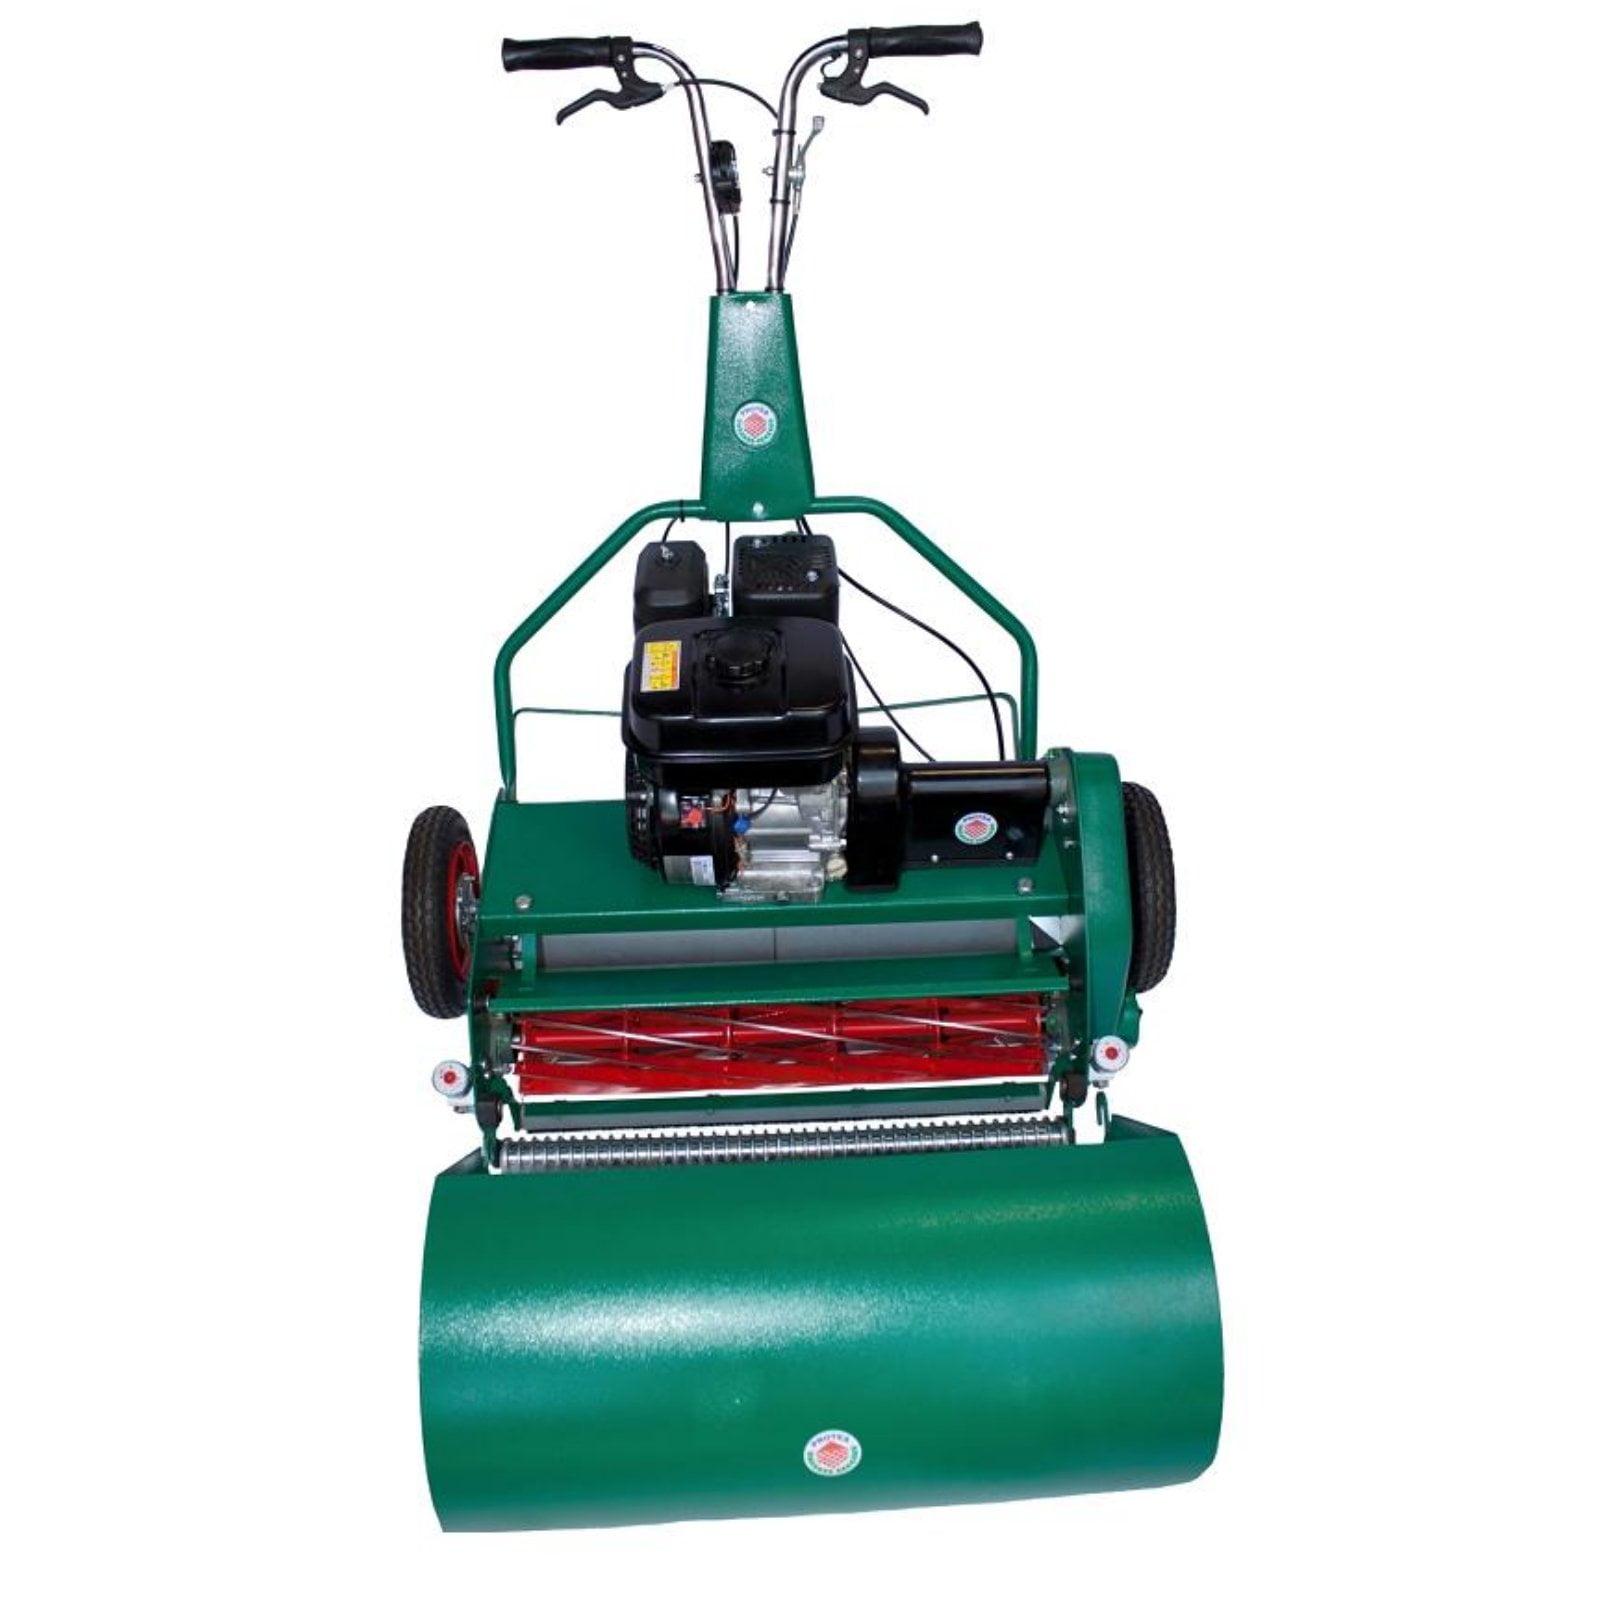 SI GOLF Putting Green Mower